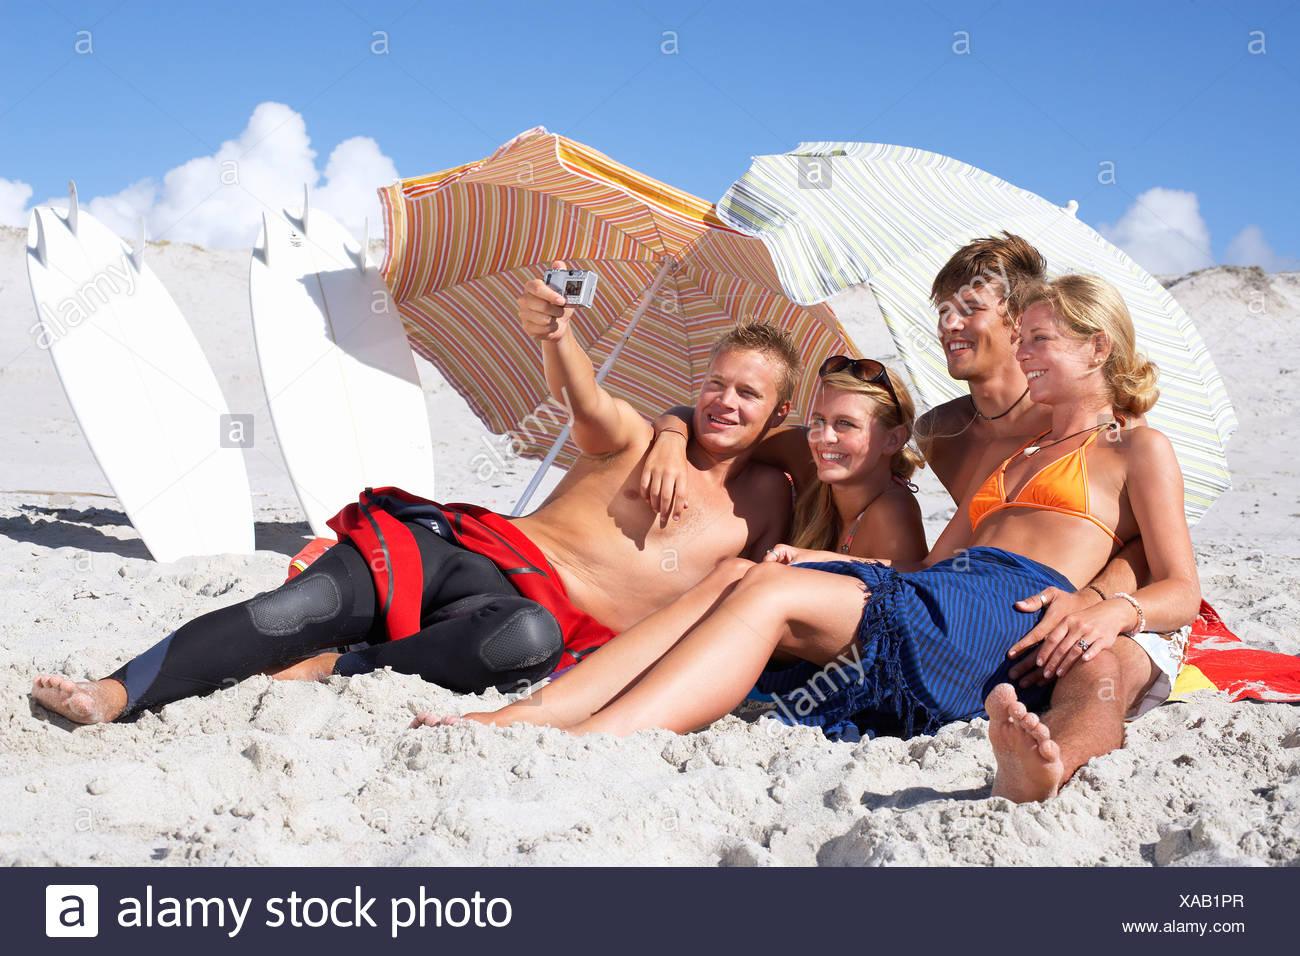 Pics of women in small bikinis